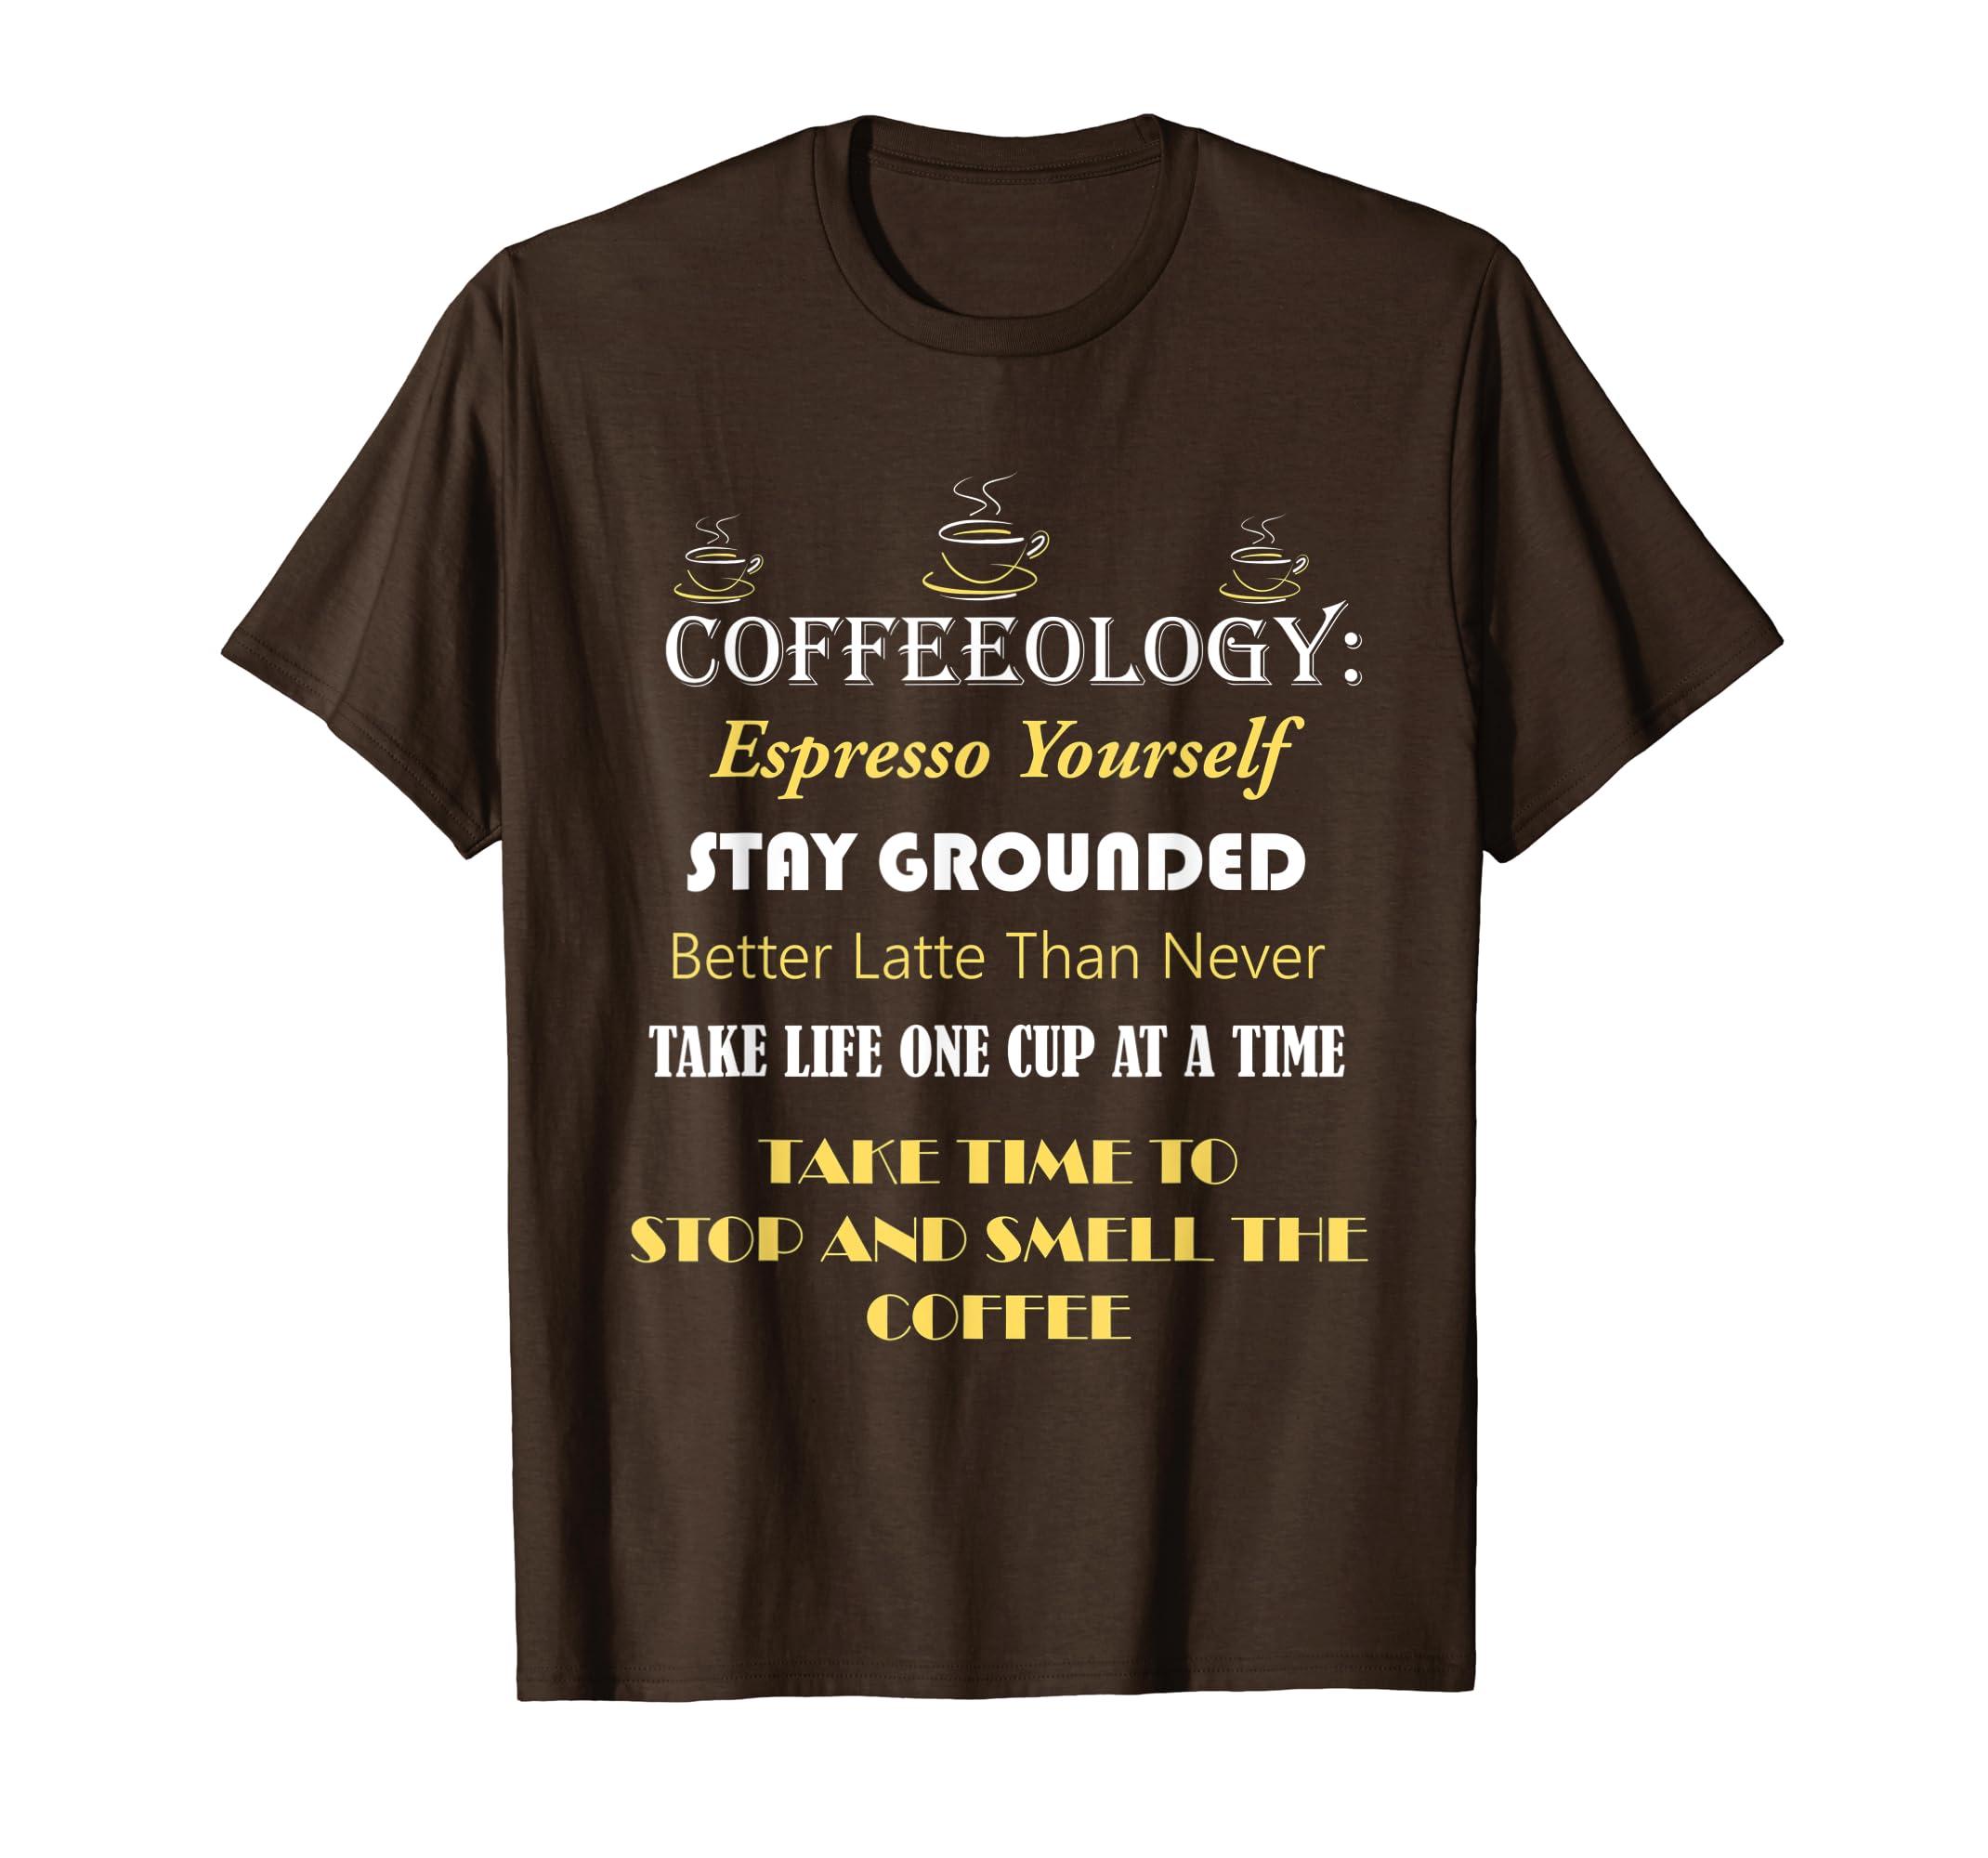 4da02ed77 Amazon.com: Coffeeology Funny Coffee Quotes T-shirt: Clothing